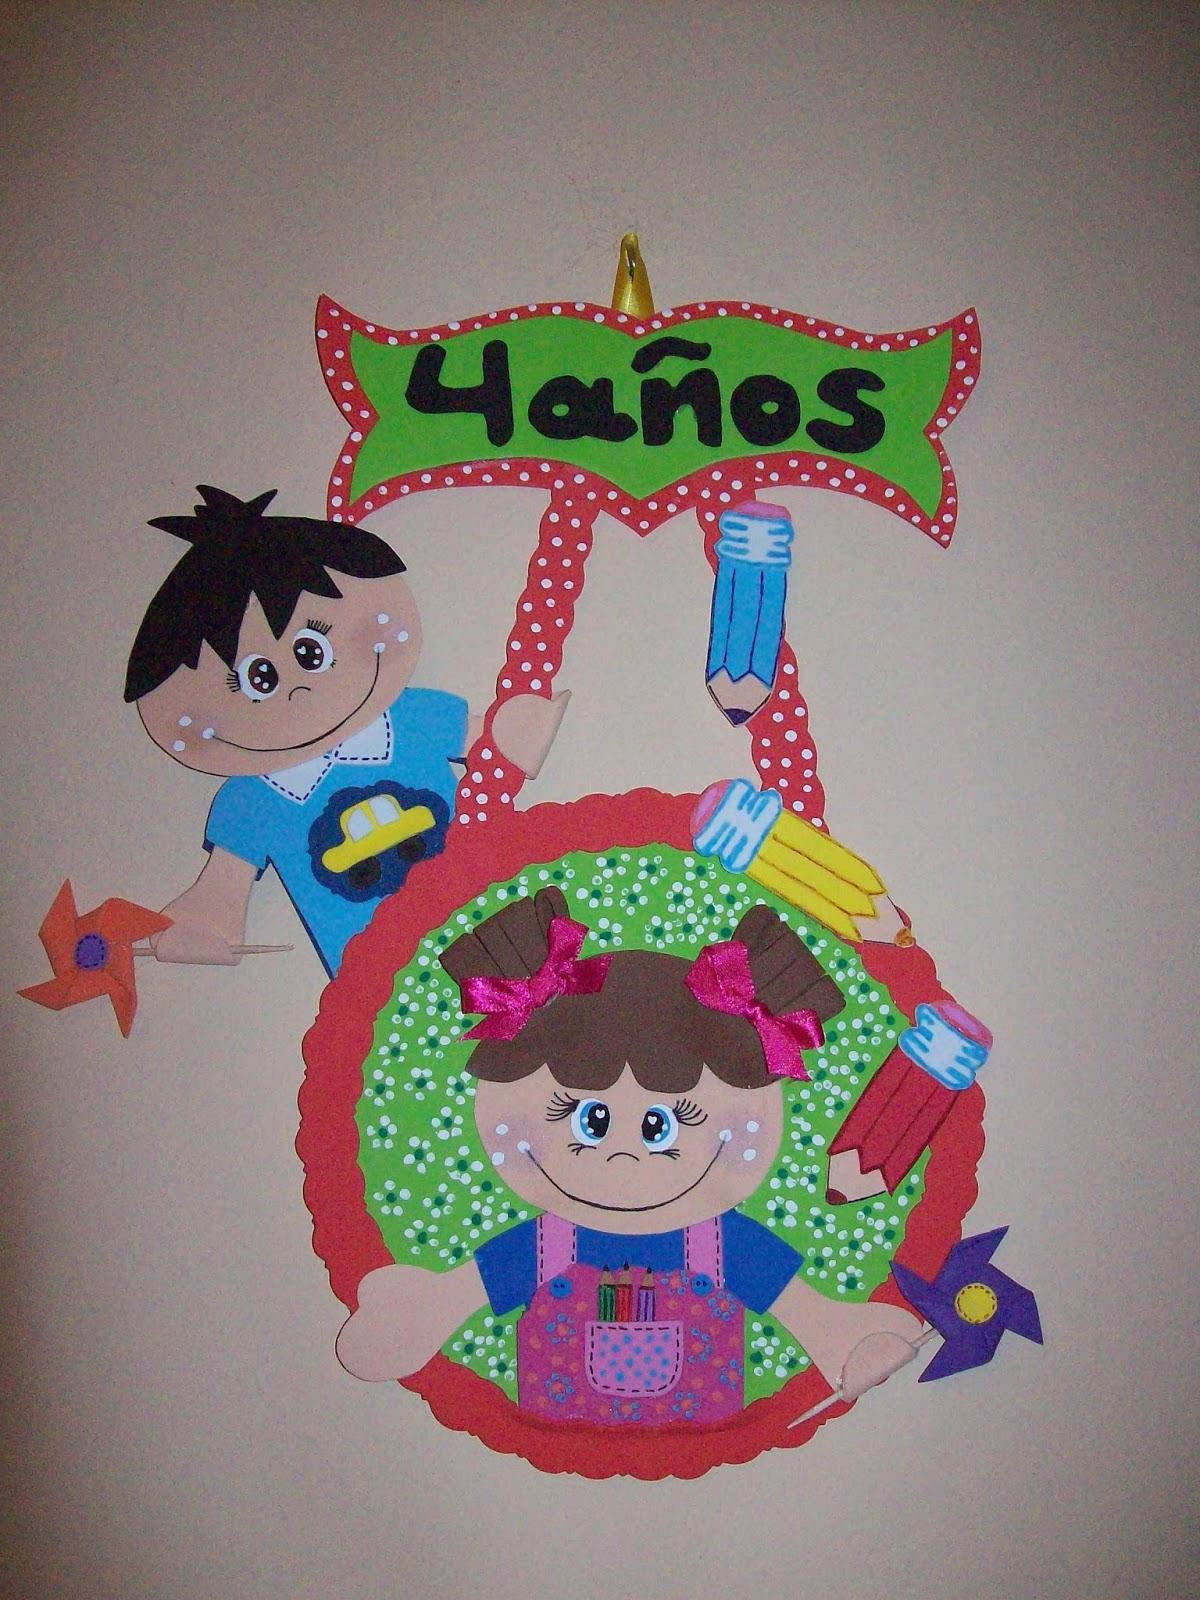 Mi taller de dulces ilusiones cartel fofuchero aula 4 for Decoracion aula infantil